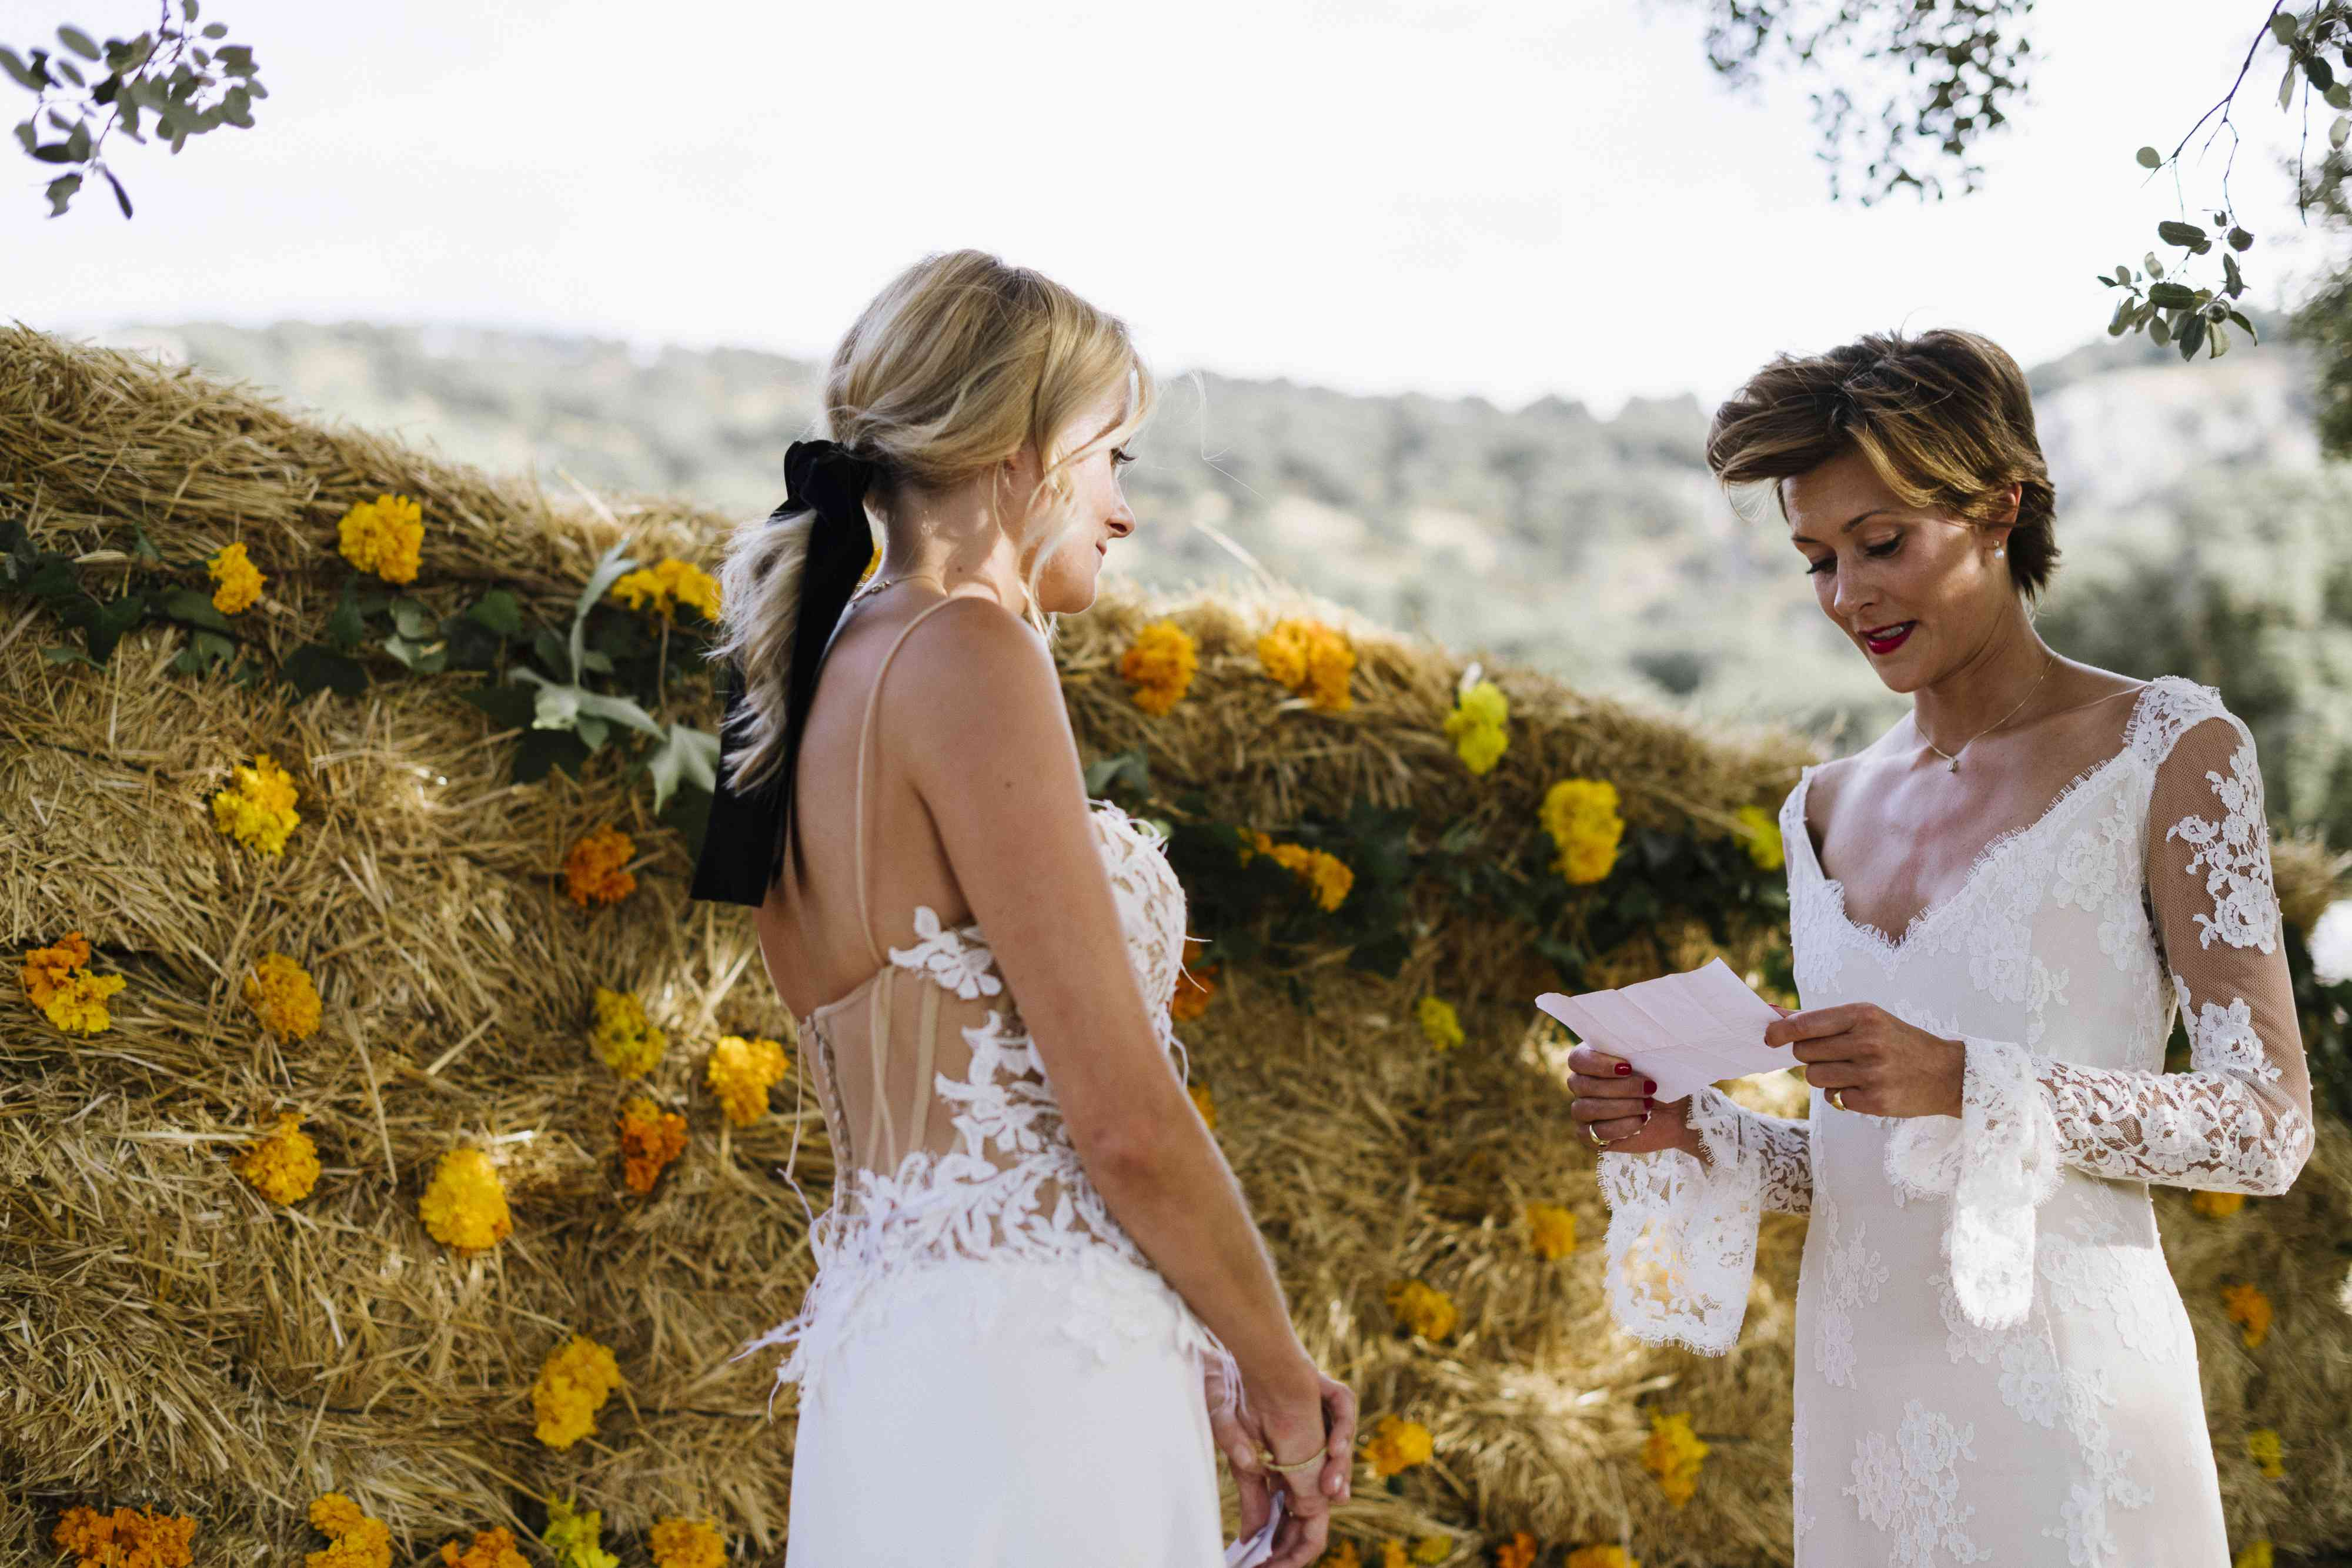 brides exchanging vows